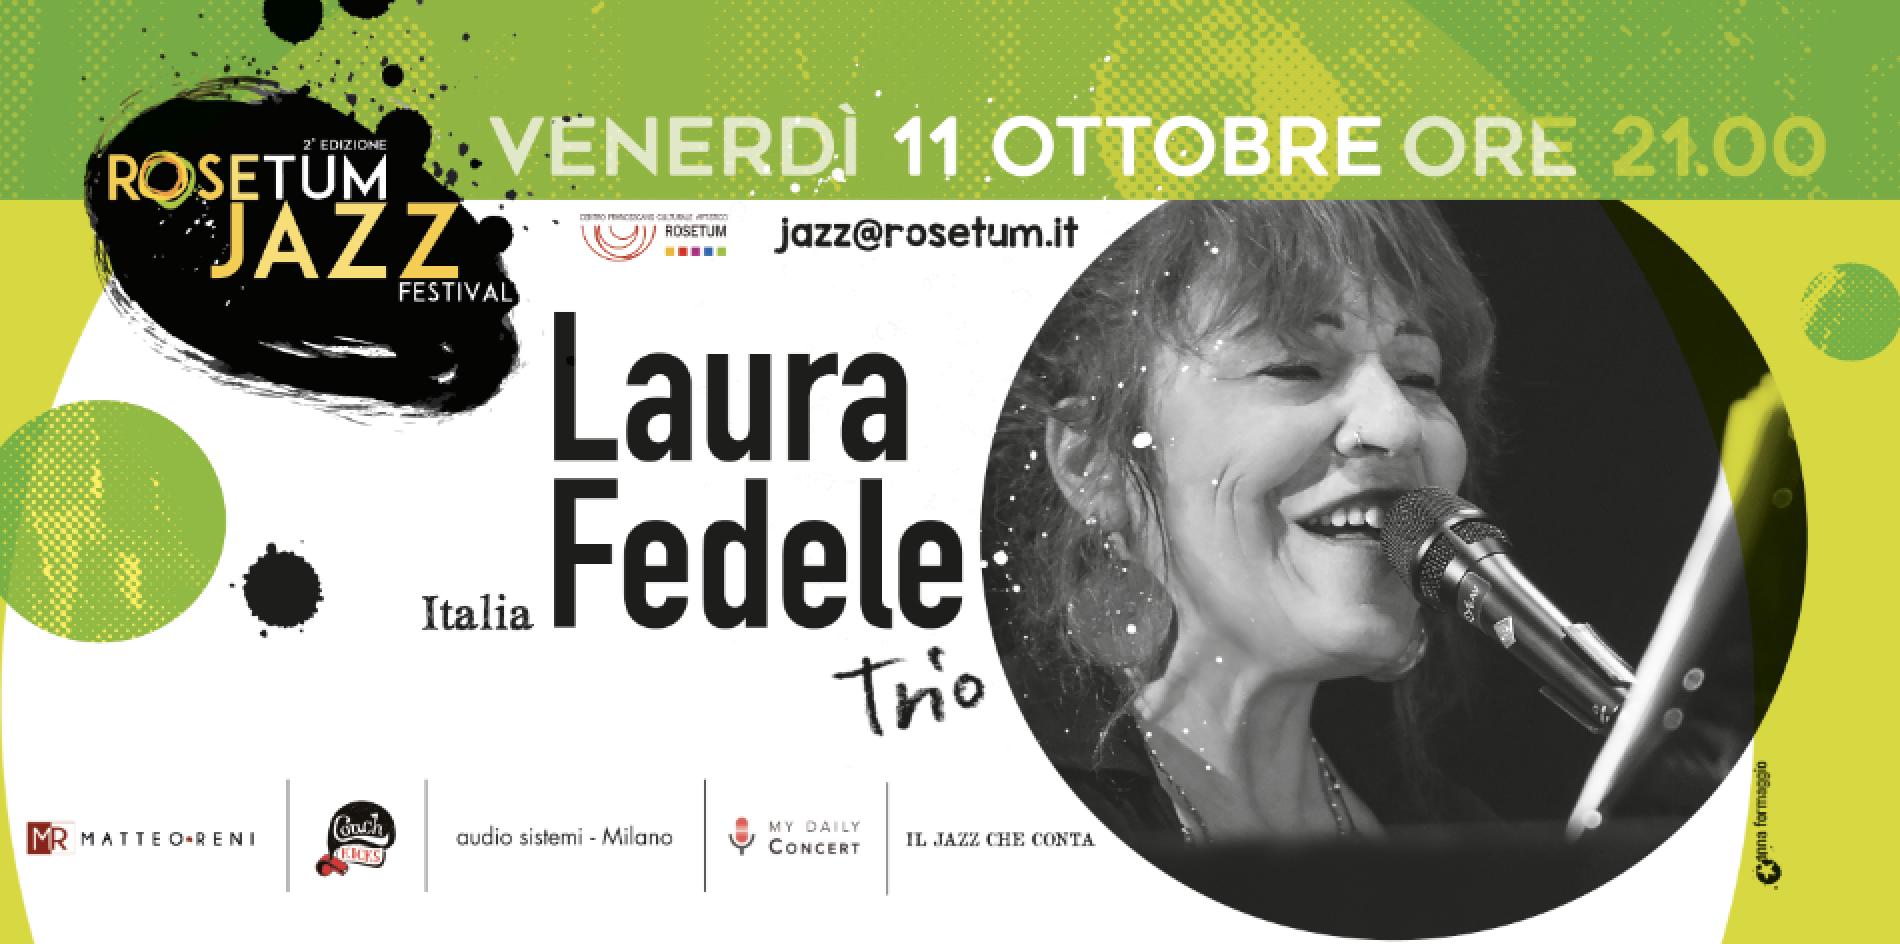 Laura Fedele Rosetum jazz Festival